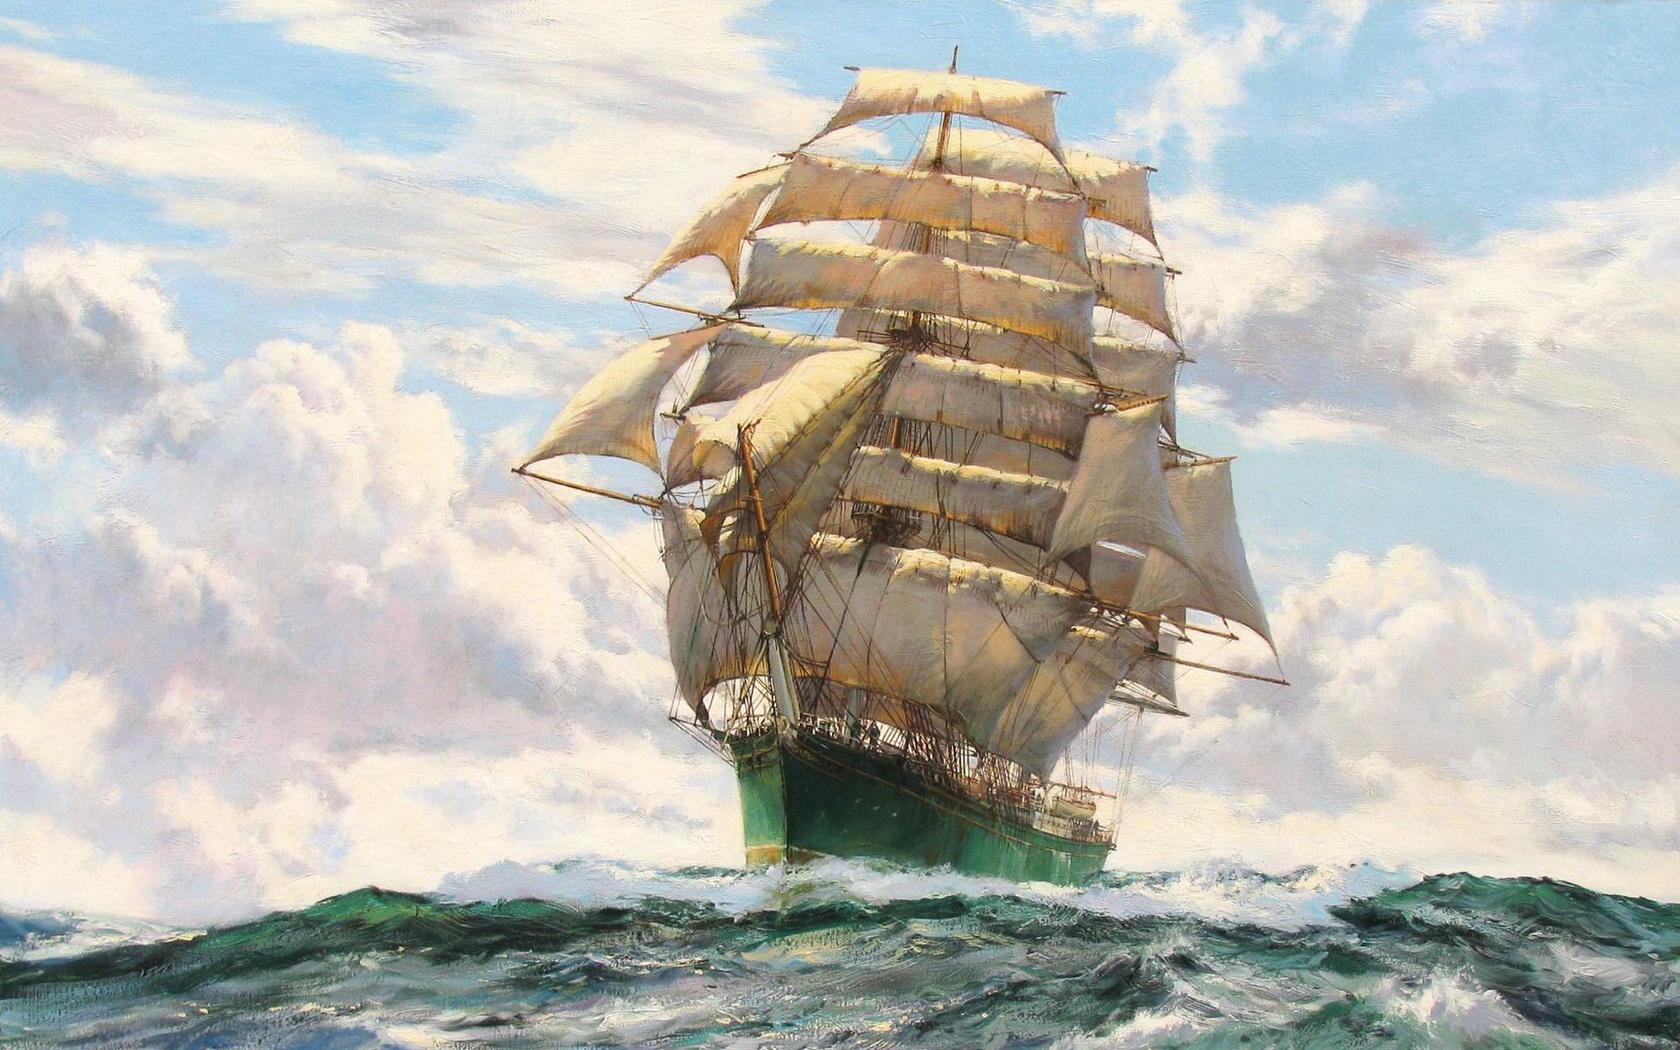 Sailing Ship Computer Wallpapers Desktop Backgrounds 1680x1050 ID 1680x1050